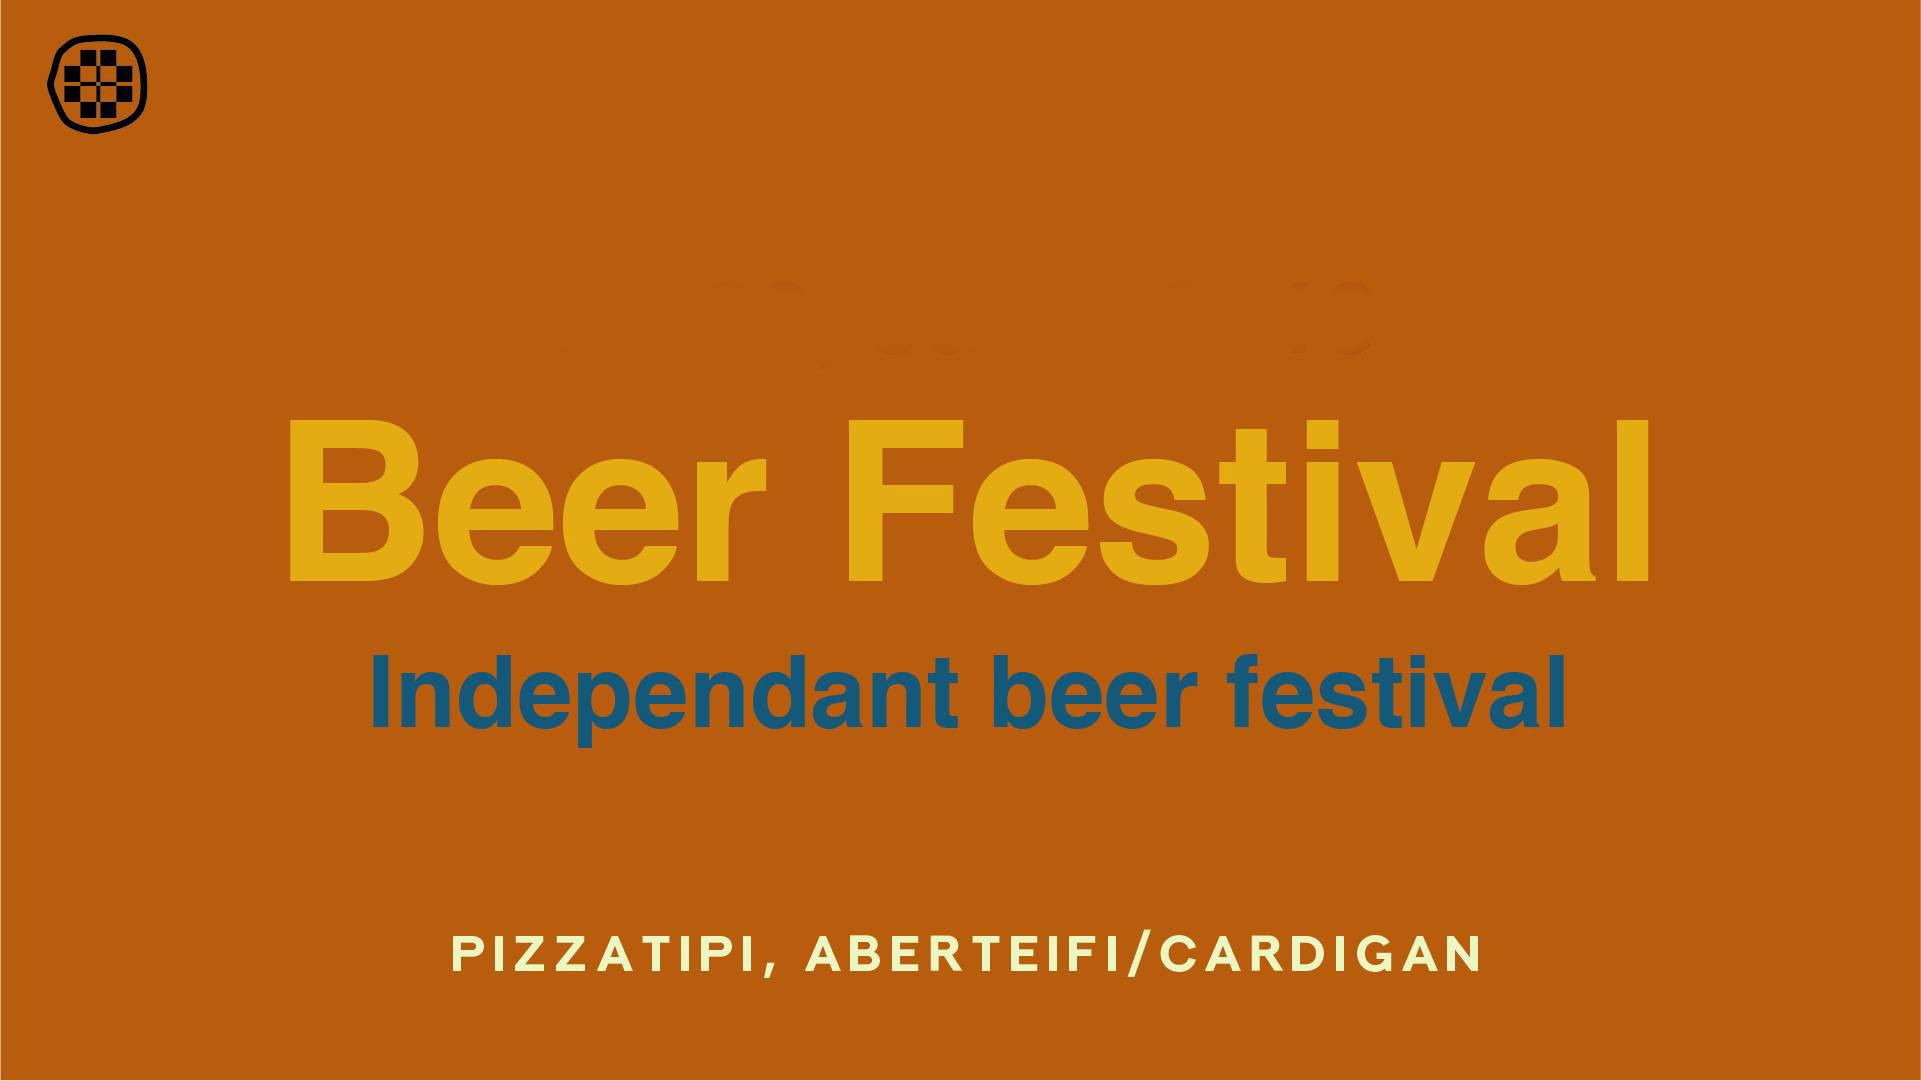 beer festival pizzatipi Cardigan